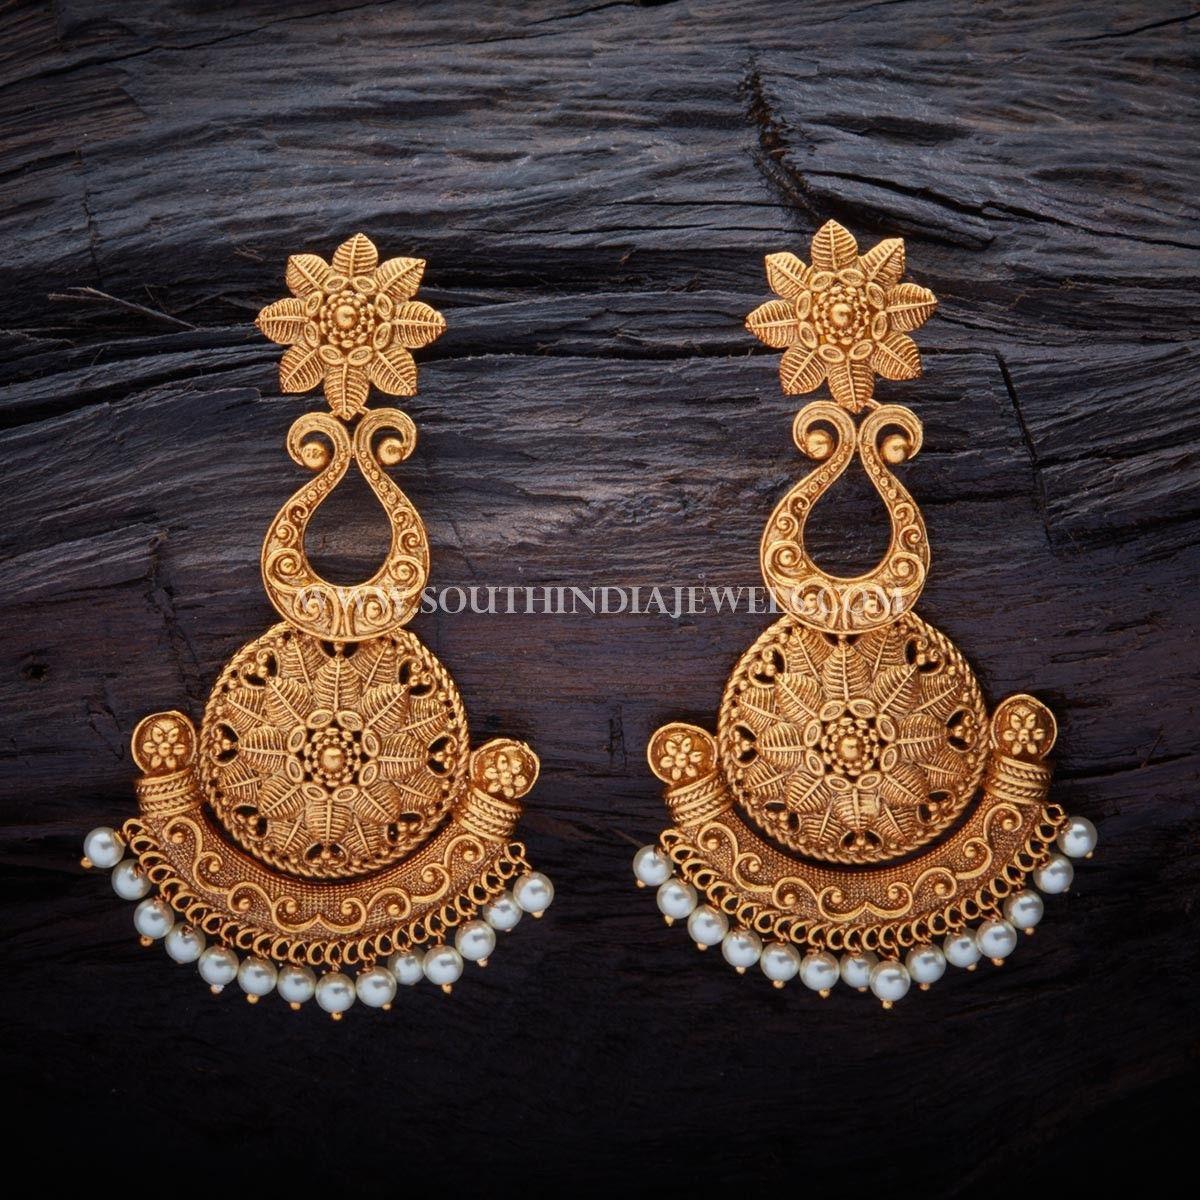 Matt Finish Antique Earrings Design | Indian jewellery ...